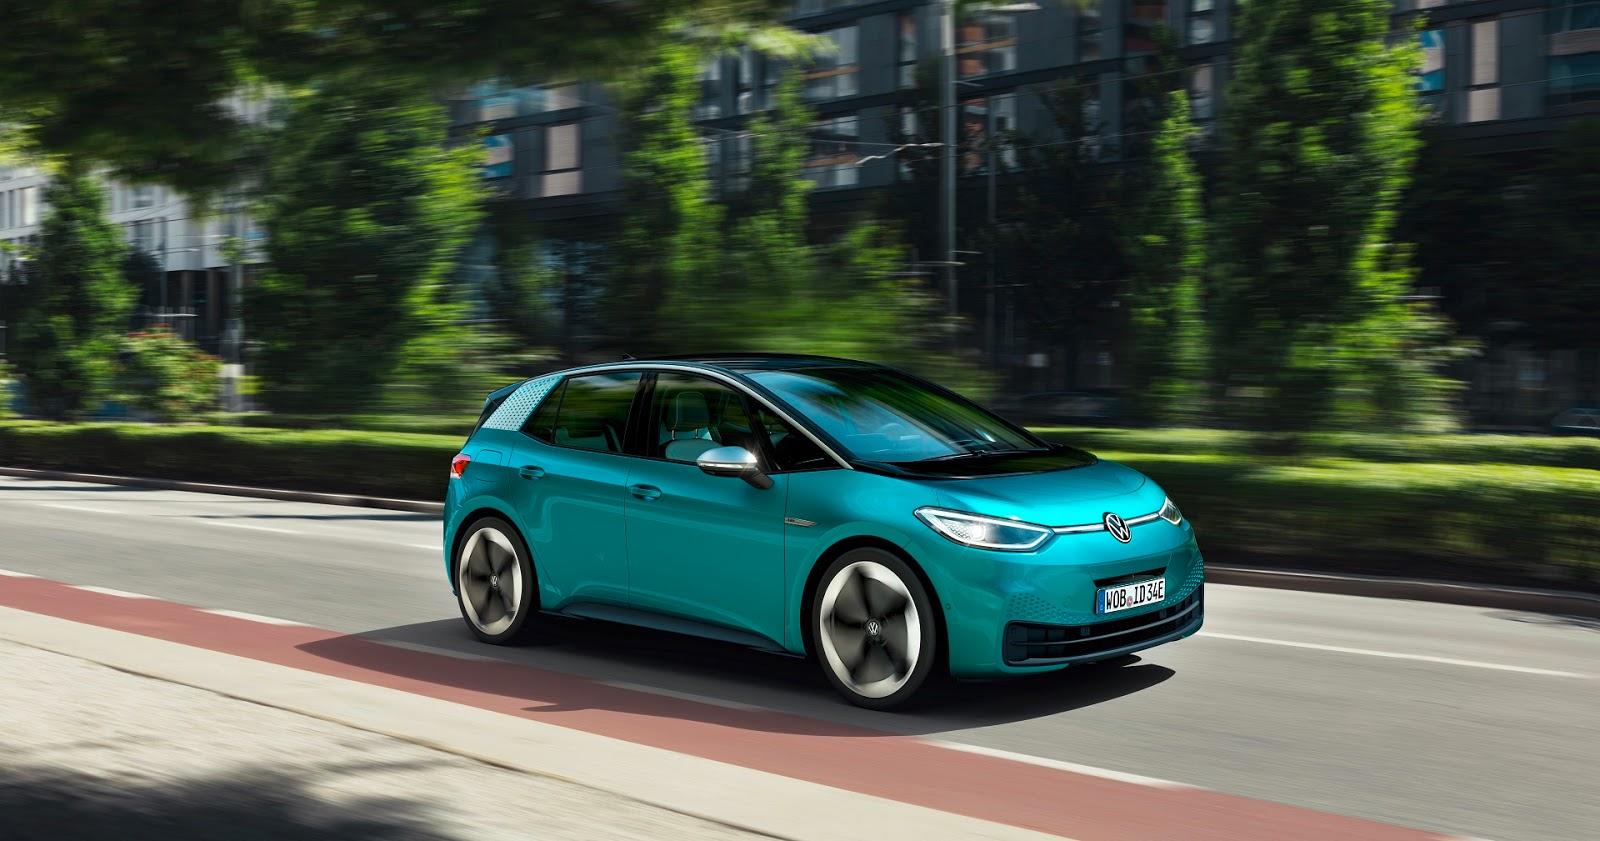 VOLKSWAGEN2BID.3 5 Γιατί το φθηνό ηλεκτρικό της Volkswagen αλλάζει την αυτοκίνηση Volkswagen, zblog, καινούργιο, καινούρια, καινούριο, Τεχνολογία, τιμες, ΦΩΤΟ, φωτογραφίες